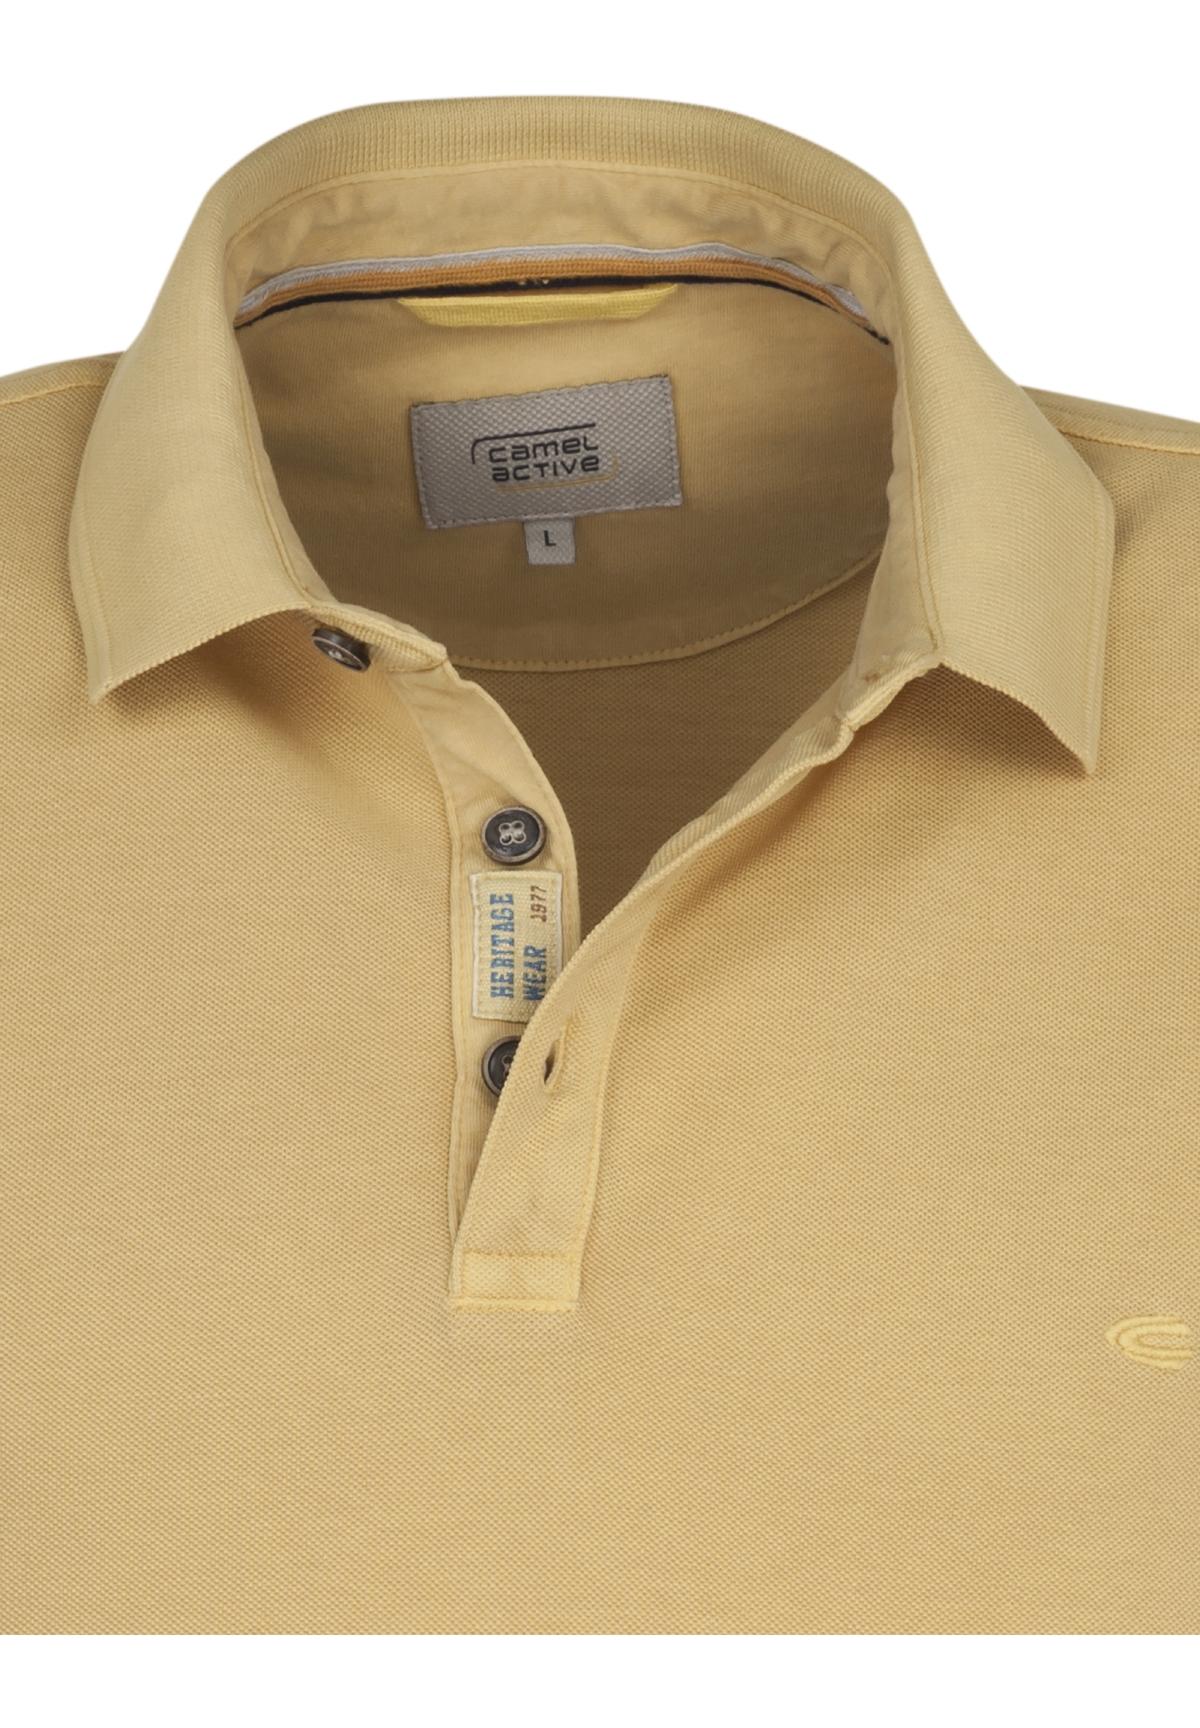 Camel-Active-Herren-Shirt-Poloshirt-Pique-Regular-Fit-NEU Indexbild 74